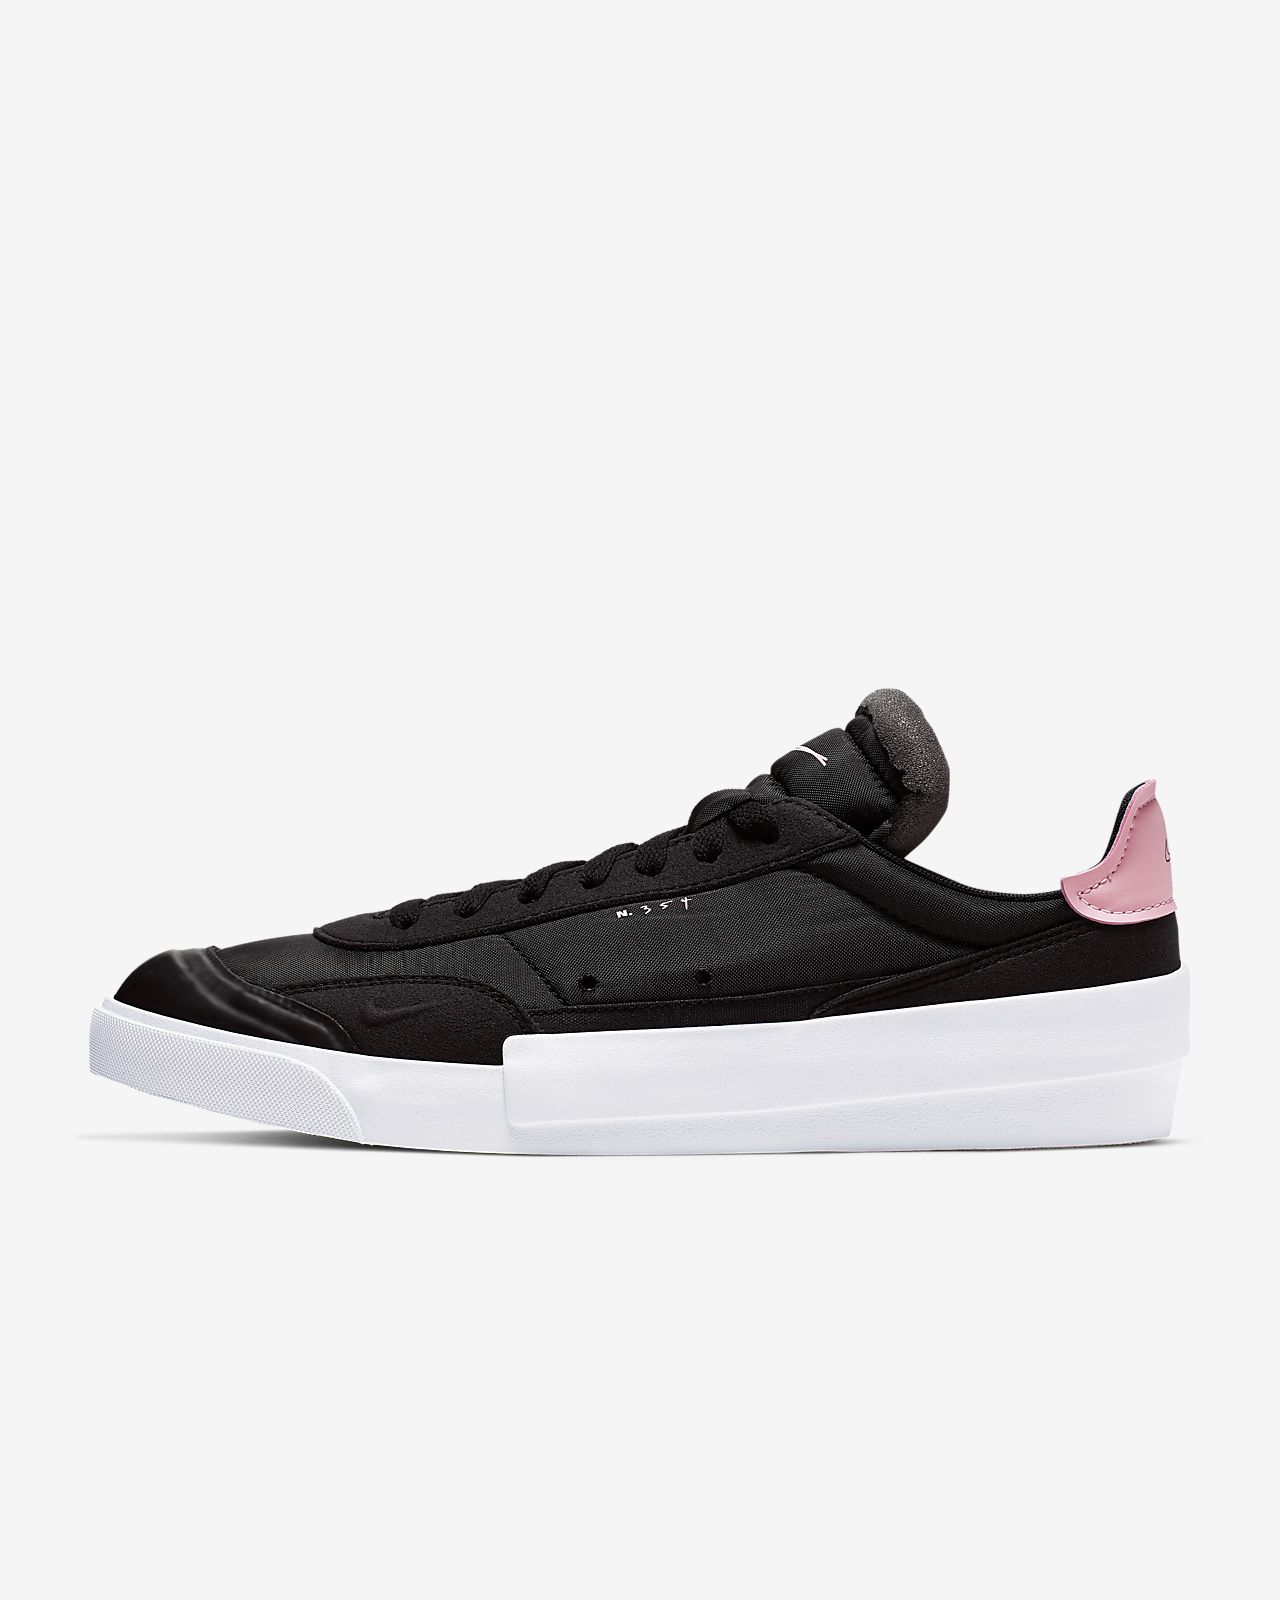 Nike Air Force 1 ''Drop Type'' presto in tutti gli store